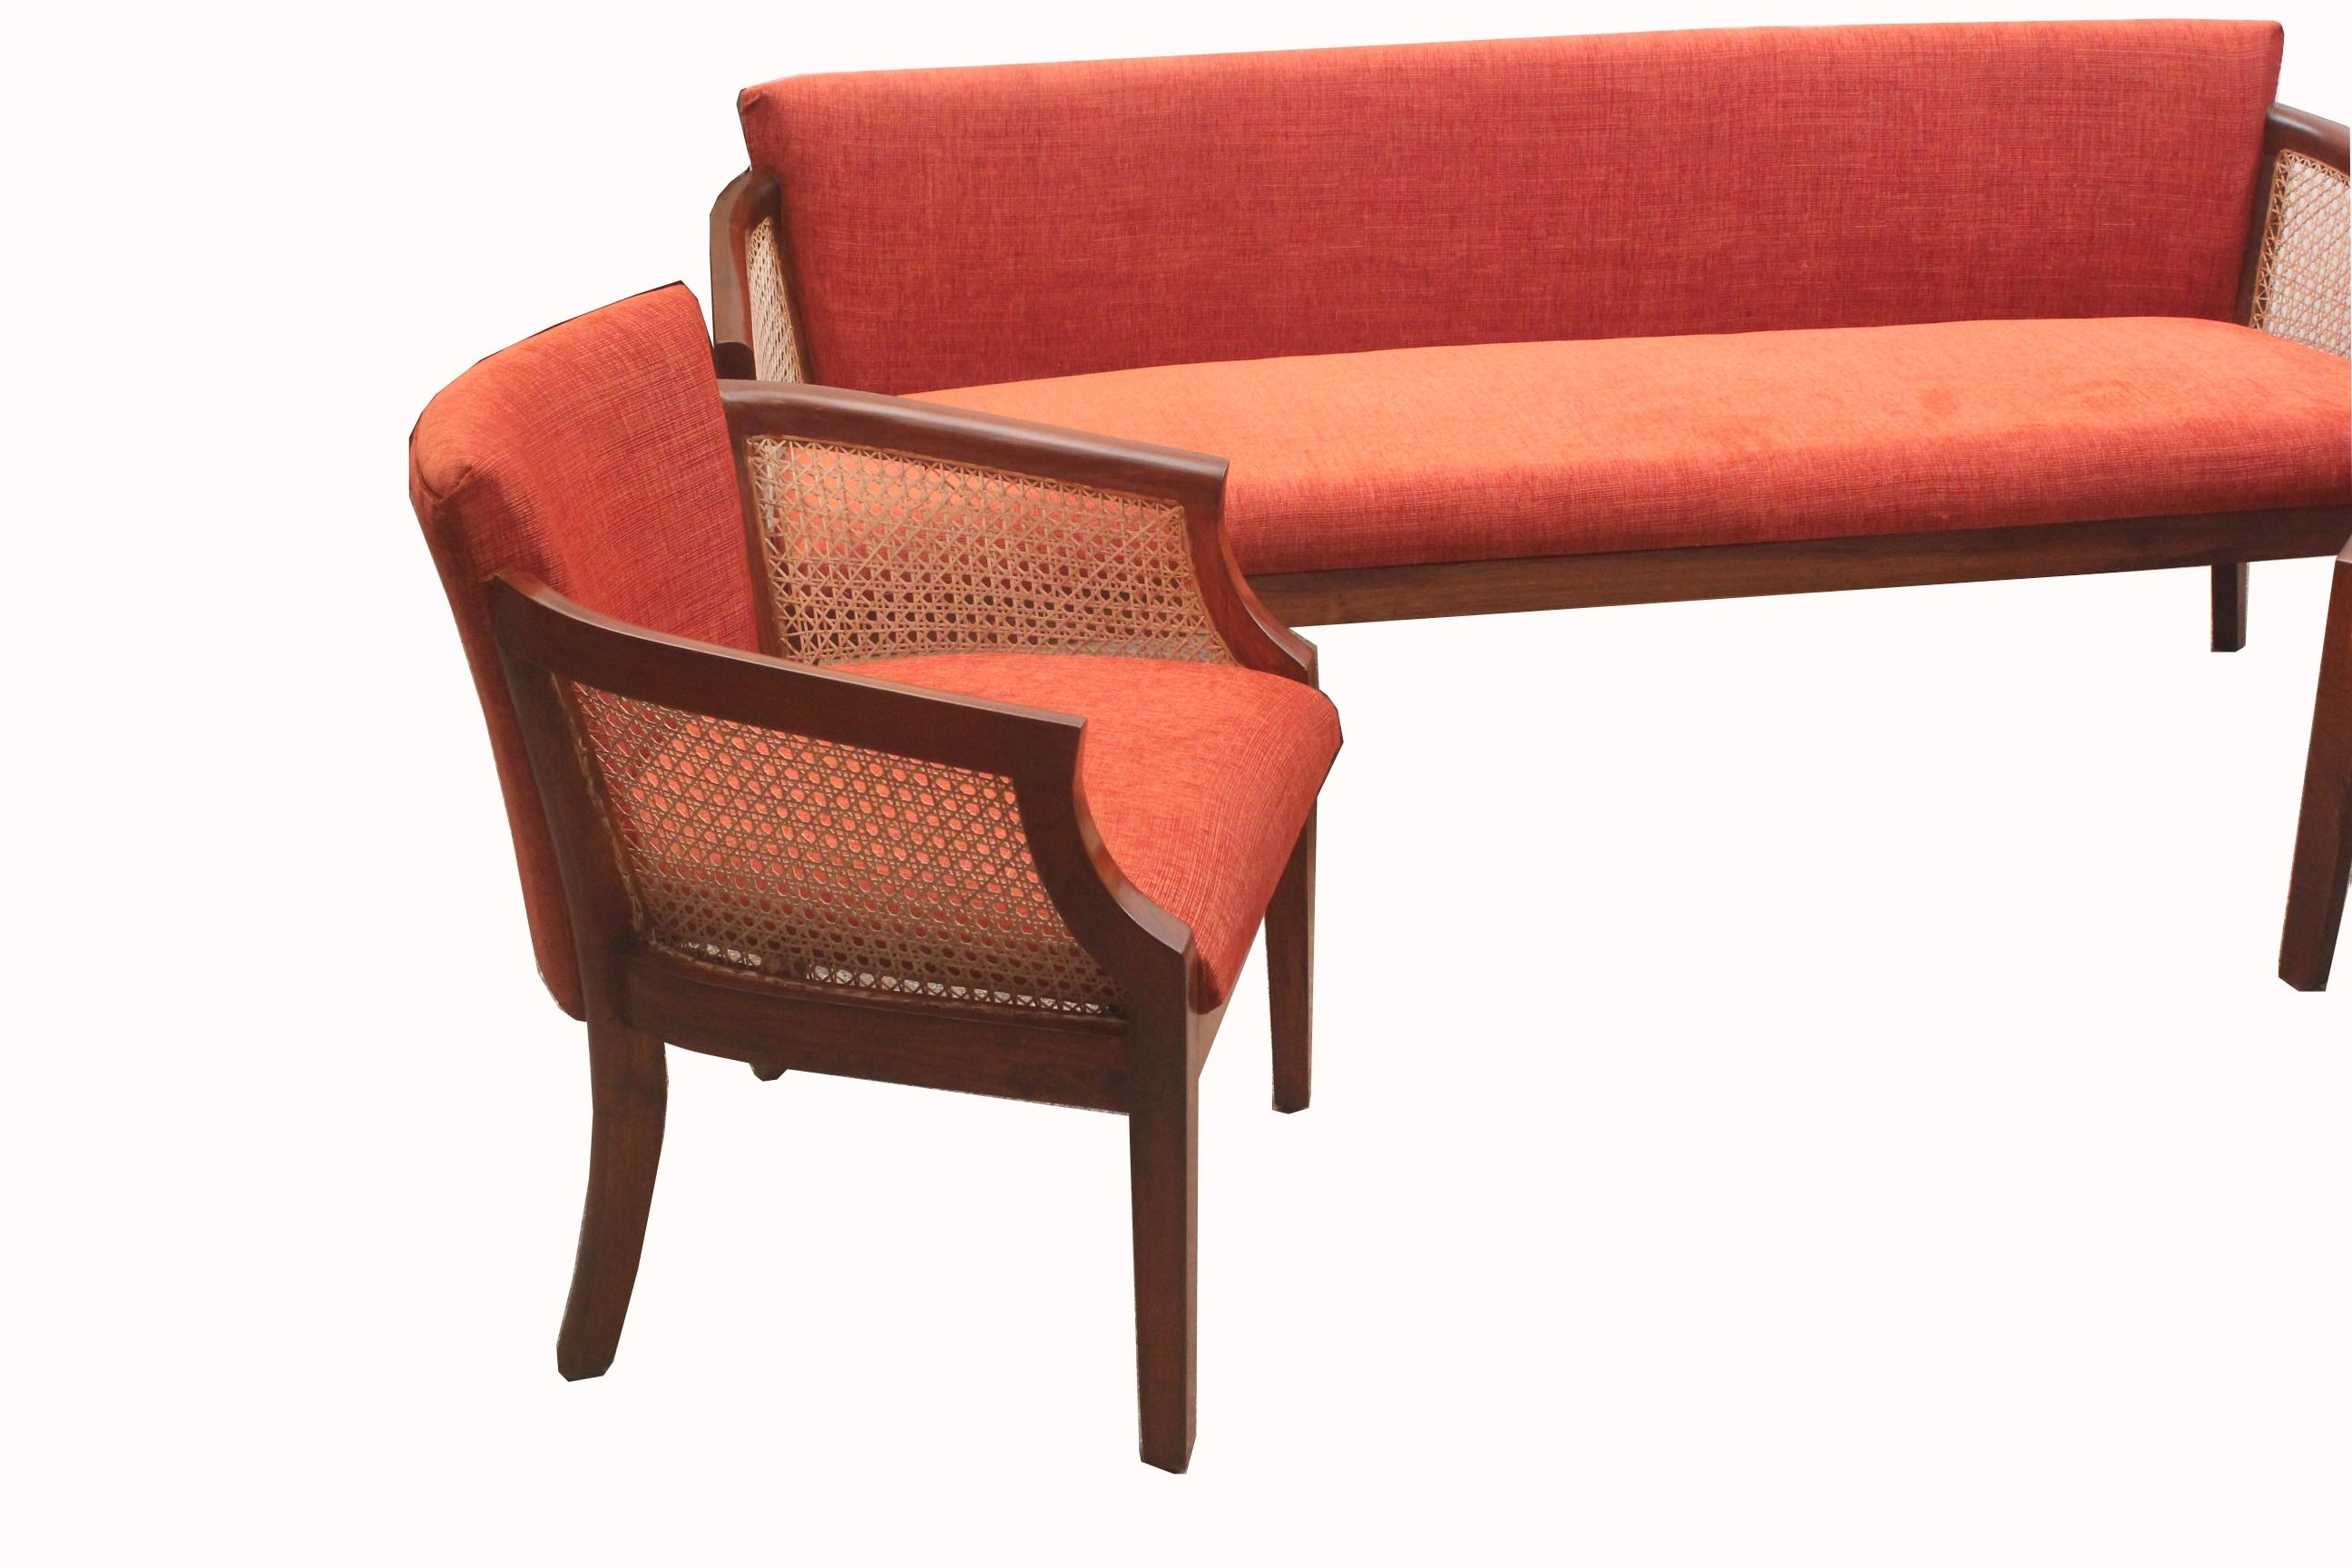 Teakwood Cushion Cane Sofa Set (Ws 98) Details | Bic Furniture India With Regard To Cane Sofas (View 13 of 20)